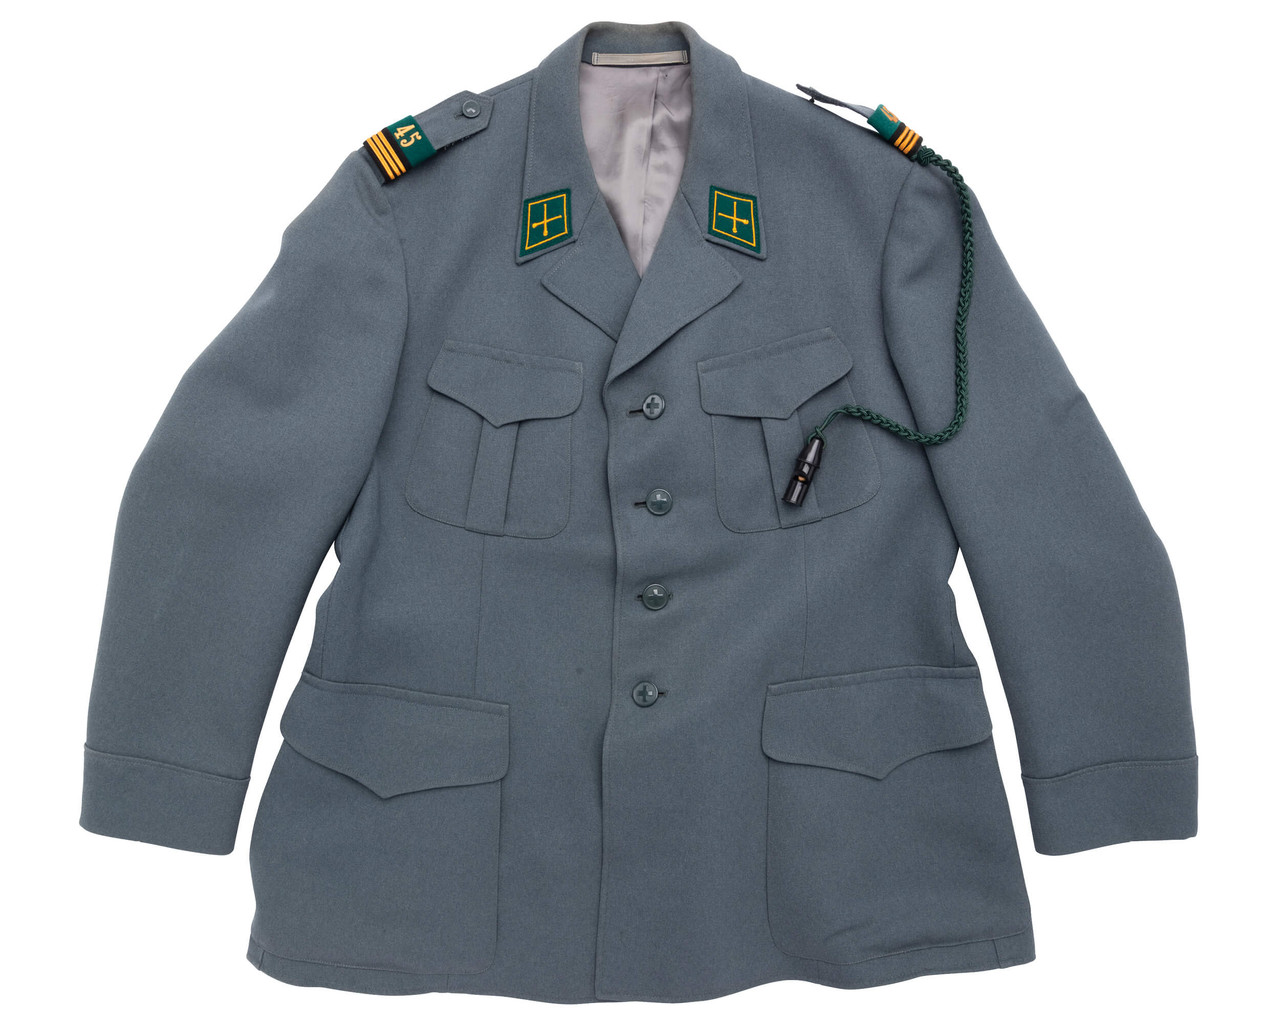 Swiss Army Captain Uniform - Mortar / Anti-Air